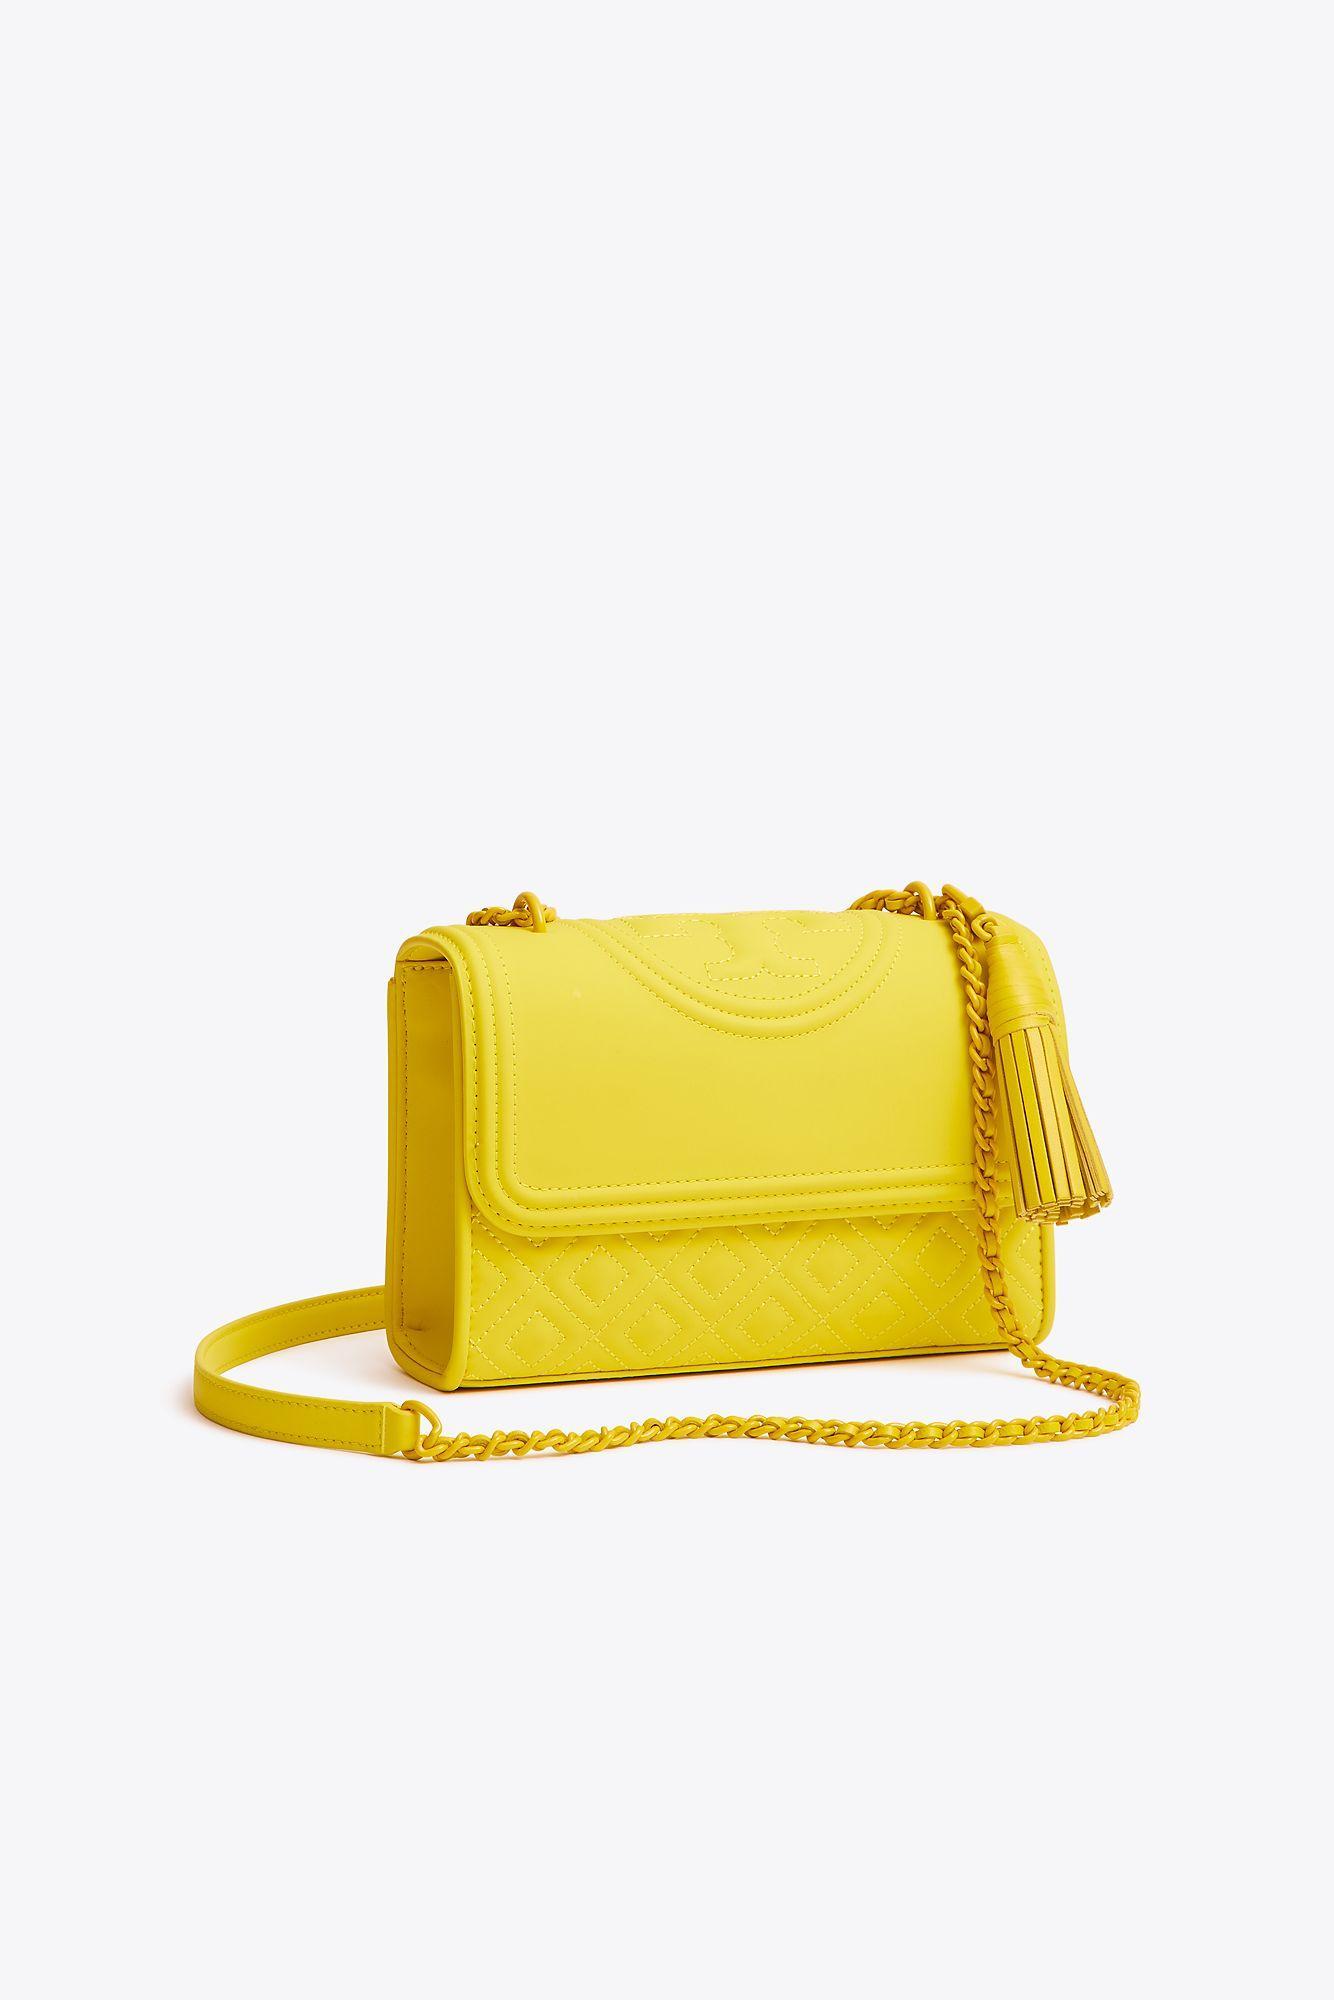 9526dd2fa9d1 Tory Burch. Women s Yellow Fleming Matte Small Convertible Shoulder Bag